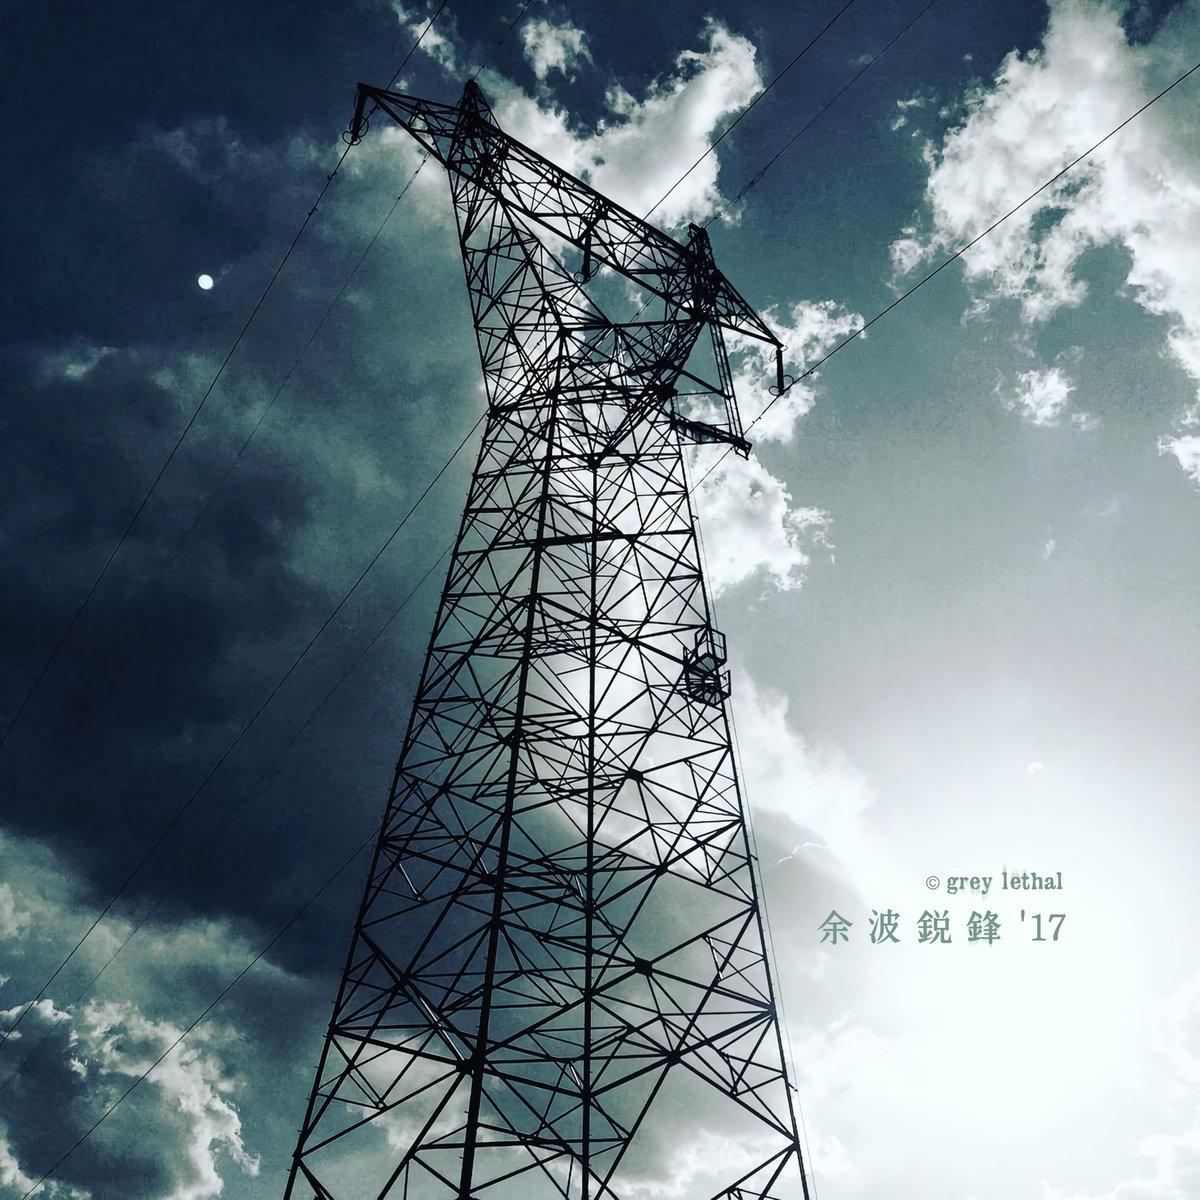 Grey Lethal - 余波鋭鋒 '17 [EP] (2017)